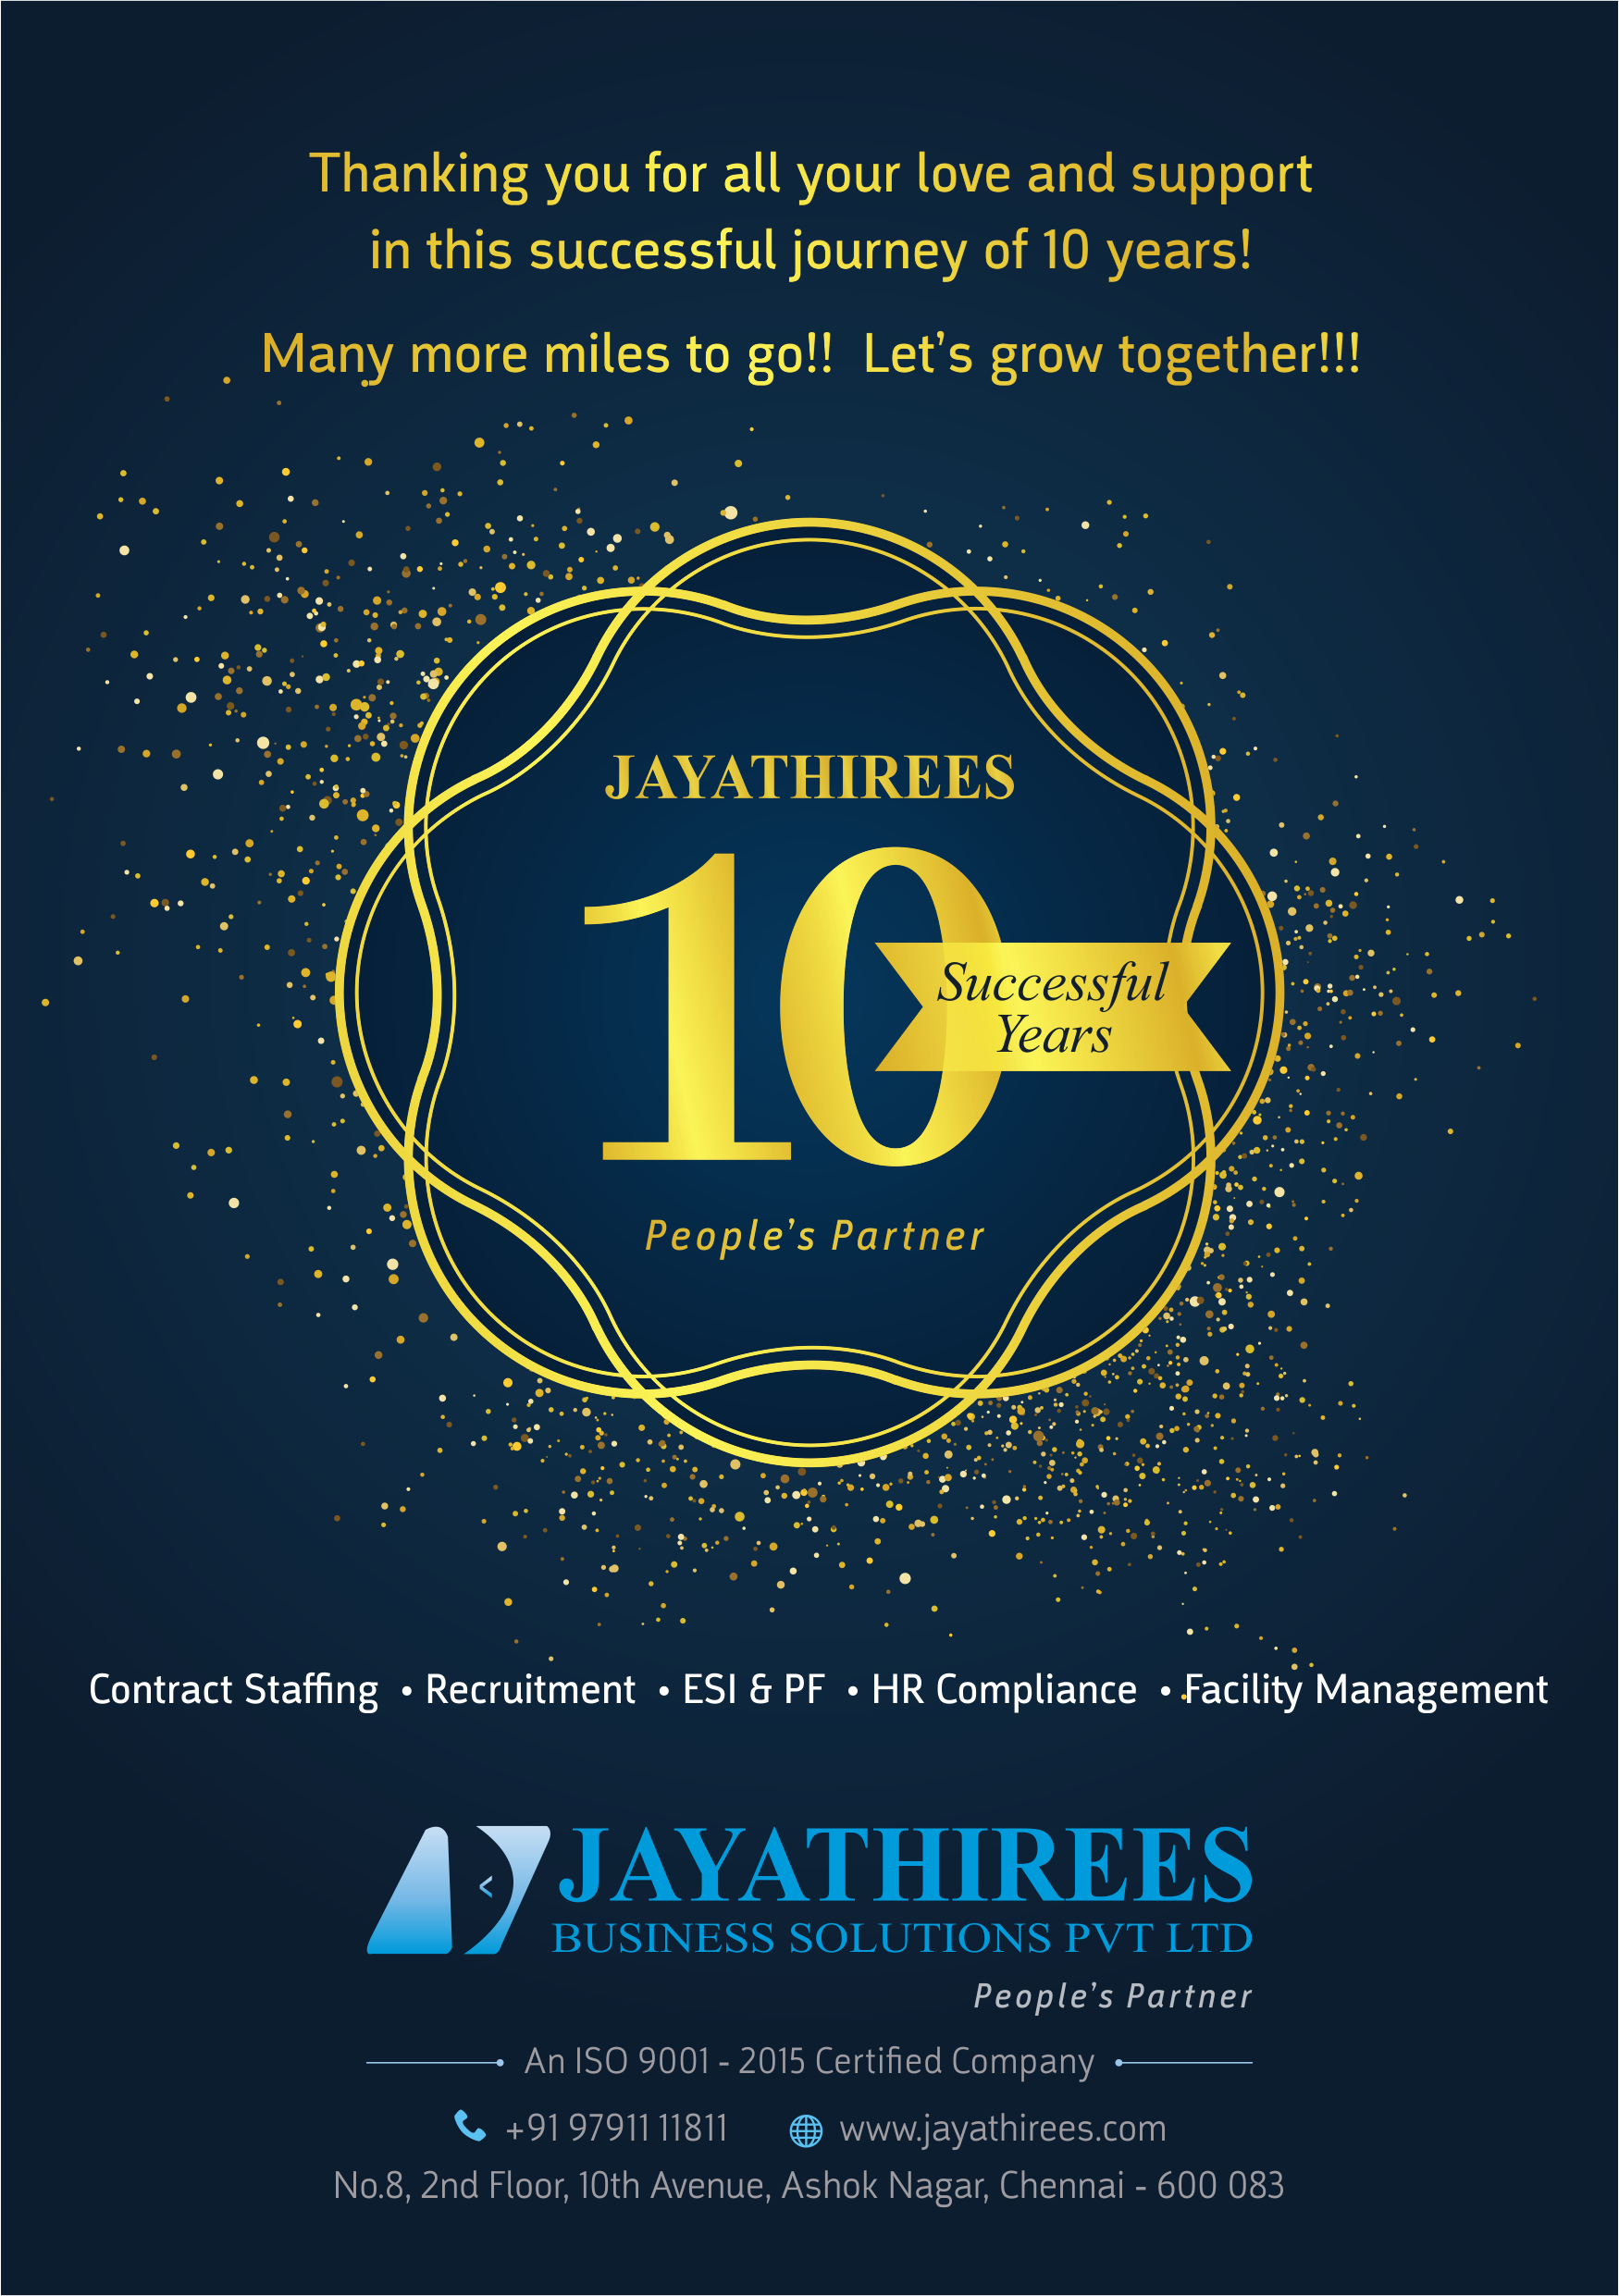 jayathirees 10th nniversary